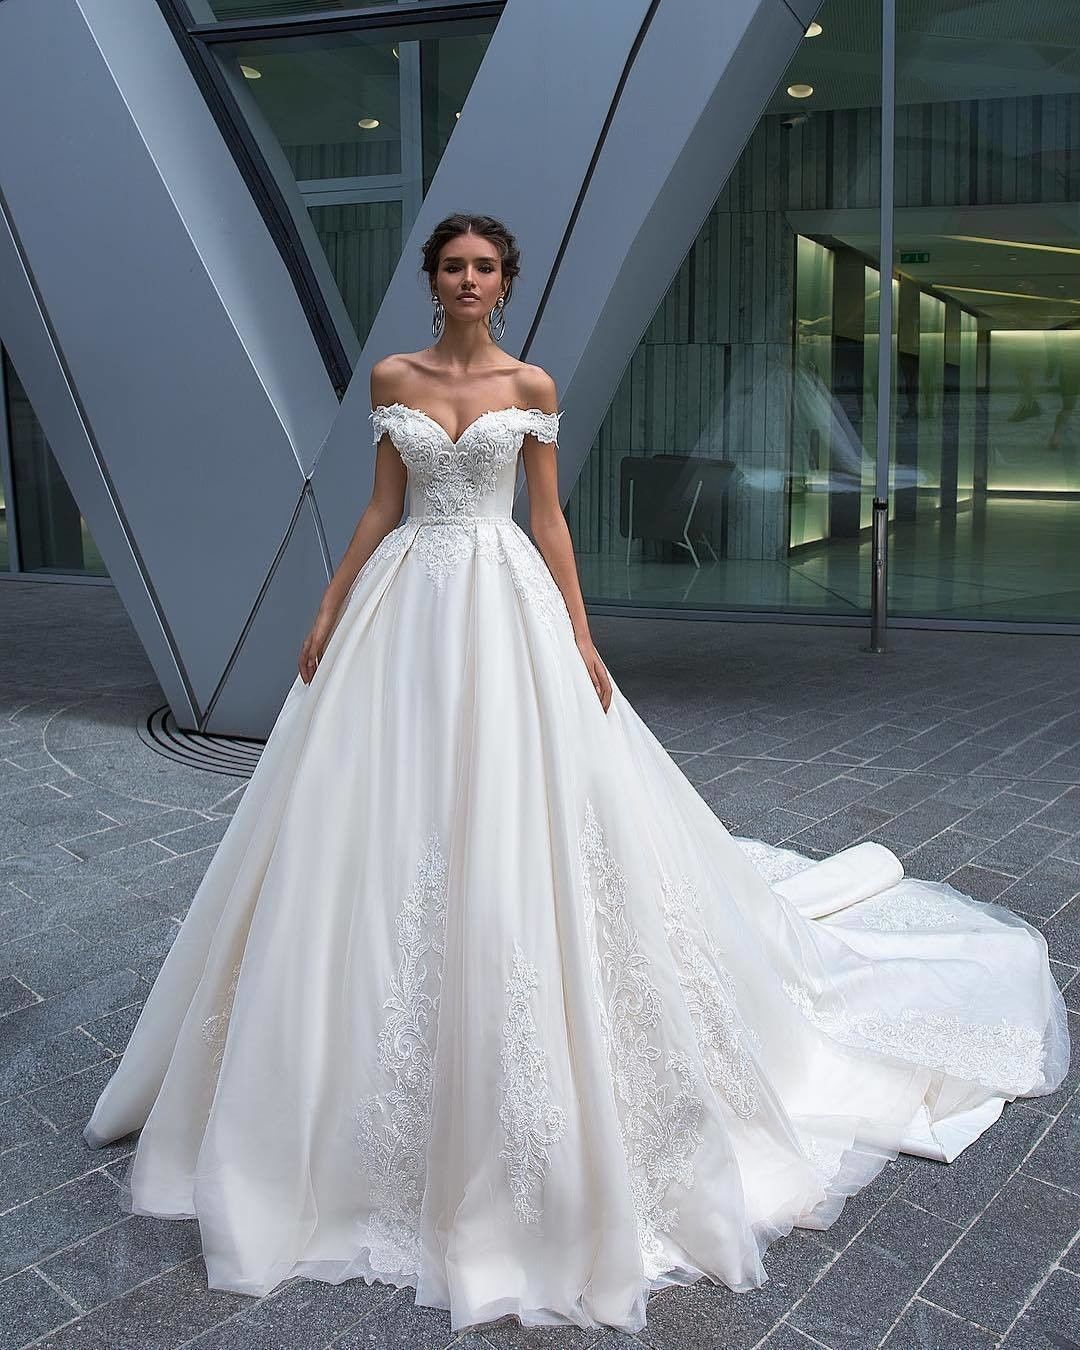 Wedding Dresses 2018 2017 Pronovias Romantic Wedding Photos Wedding Poses Wedding Photos Poses